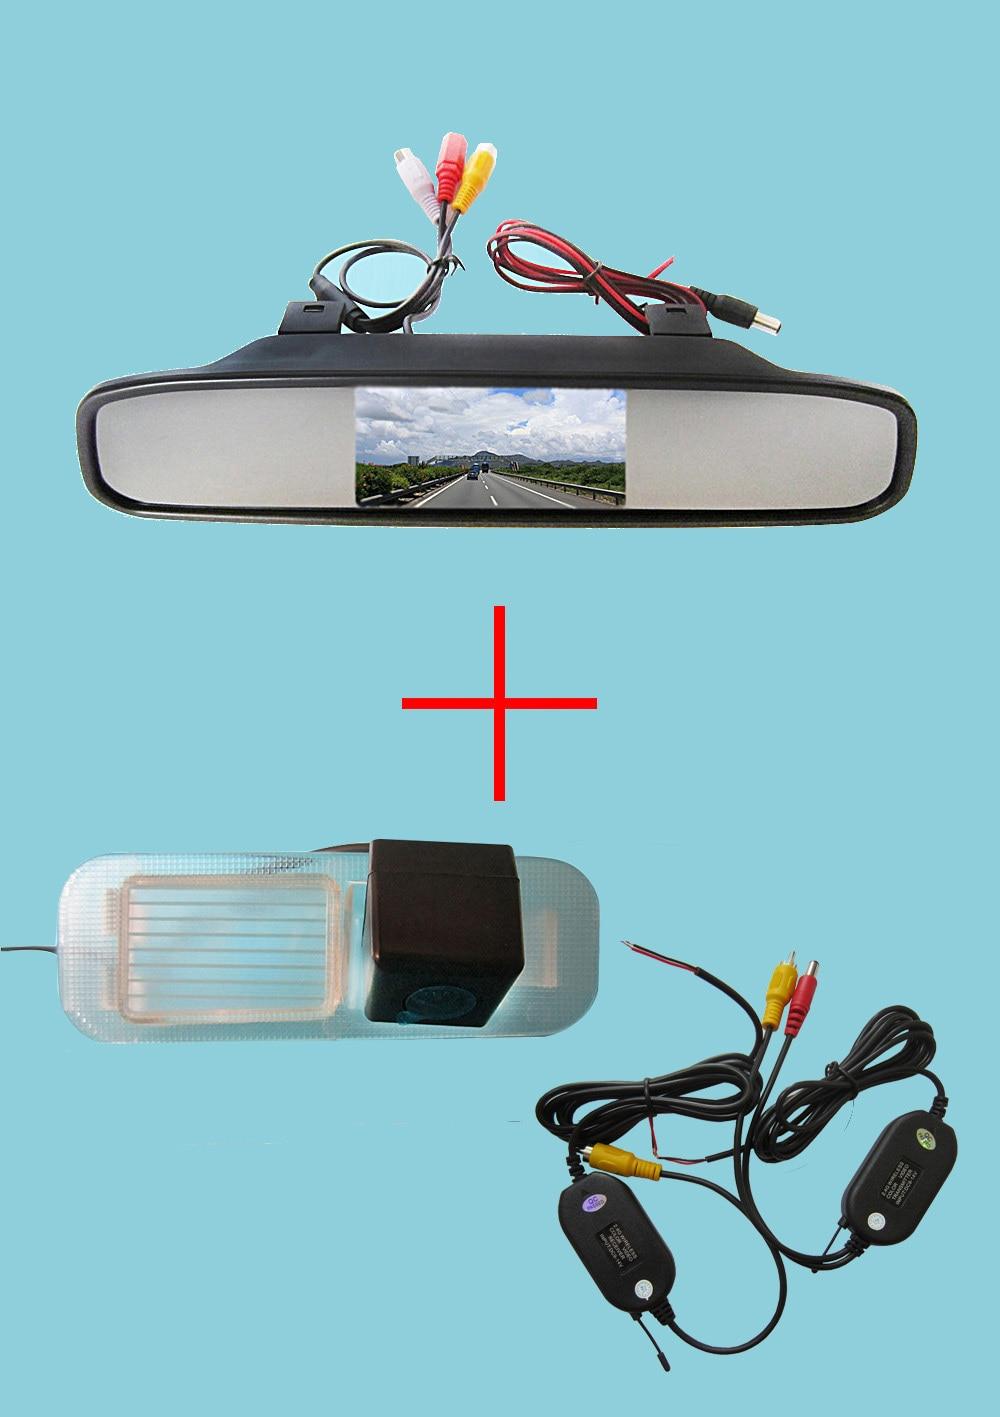 Wireless Color CCD Chip Car Chip Rear View Camera for Kia K2 RIO Sedan + 4.3 Inch rearview Mirror Monitor wireless color ccd chip car rear view camera for kia sorento sportage 4 3 inch foldable lcd tft monitor